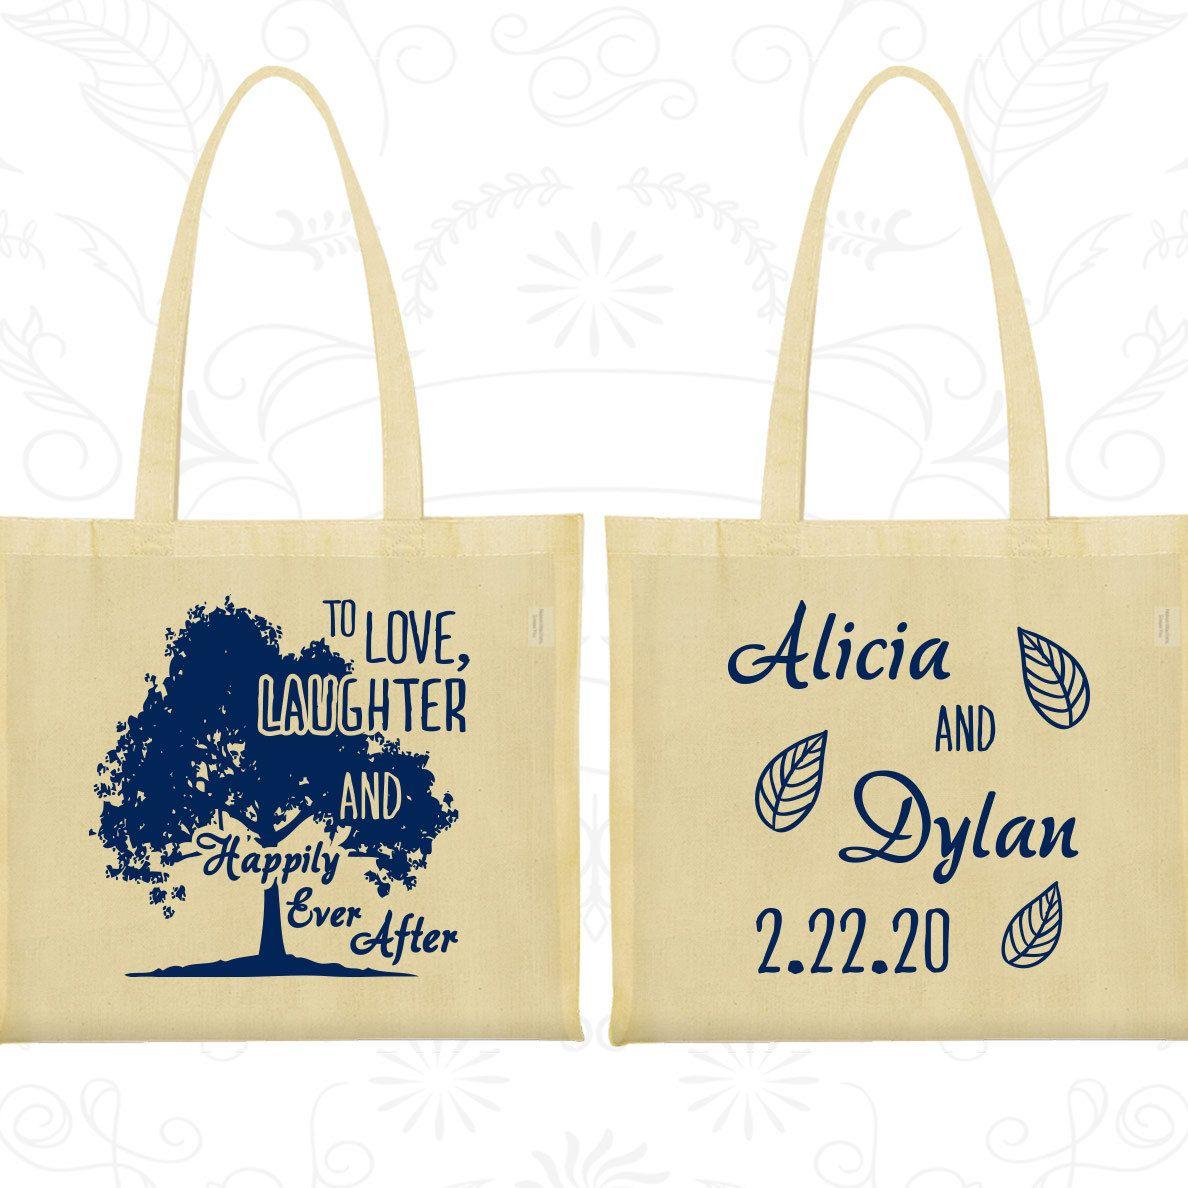 Wedding Tote, Tote Bags, Wedding Tote Bags, Personalized Tote Bags ...